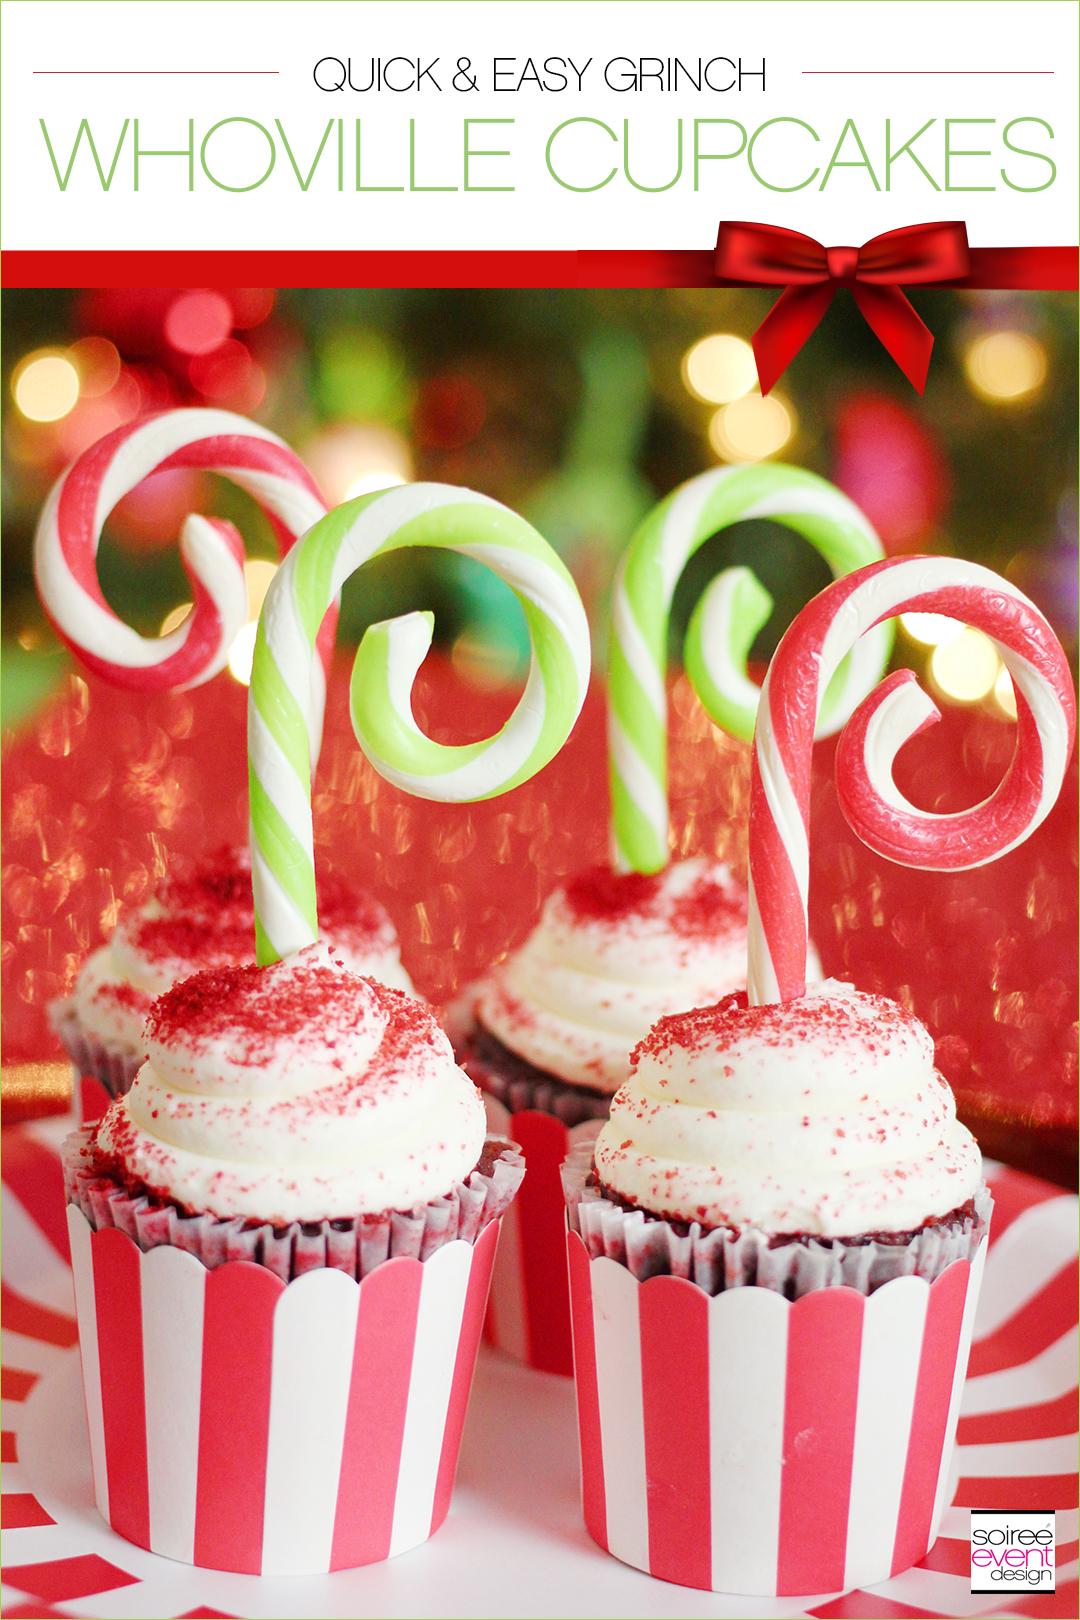 Grinch Dessert Ideas - Whoville Cupcakes